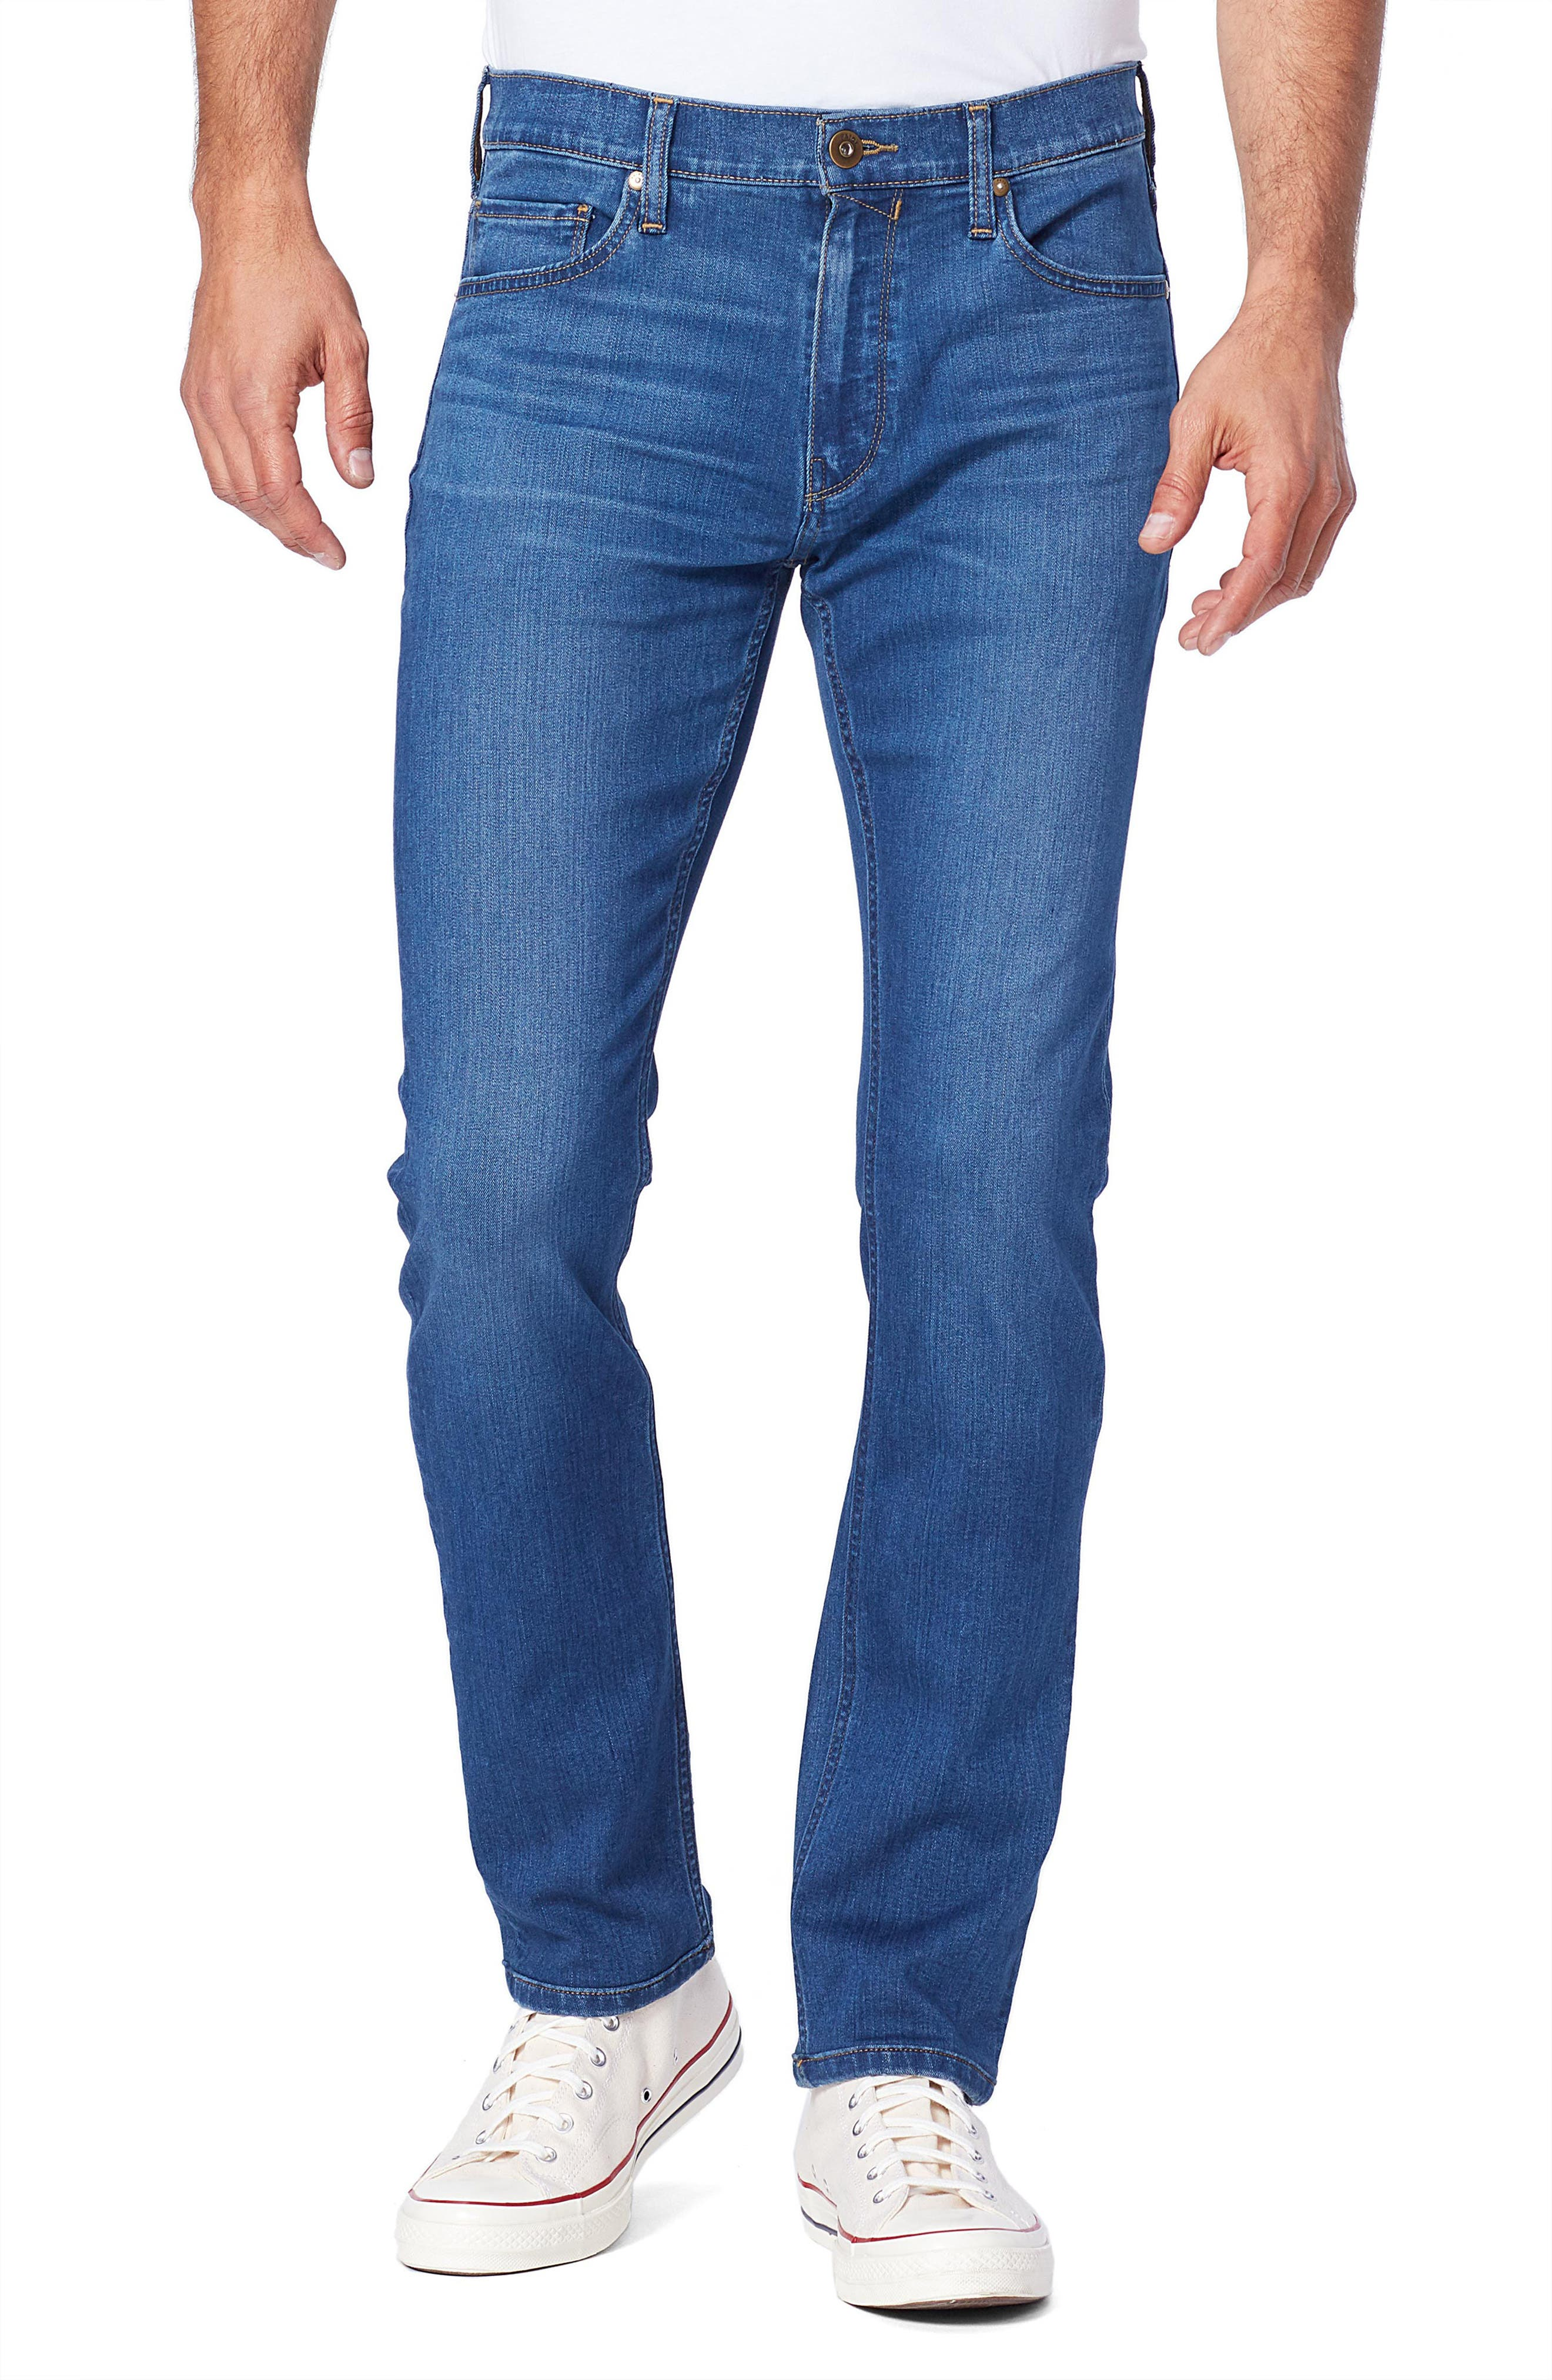 Image of PAIGE Transcend Federal Slim Straight Leg Jeans